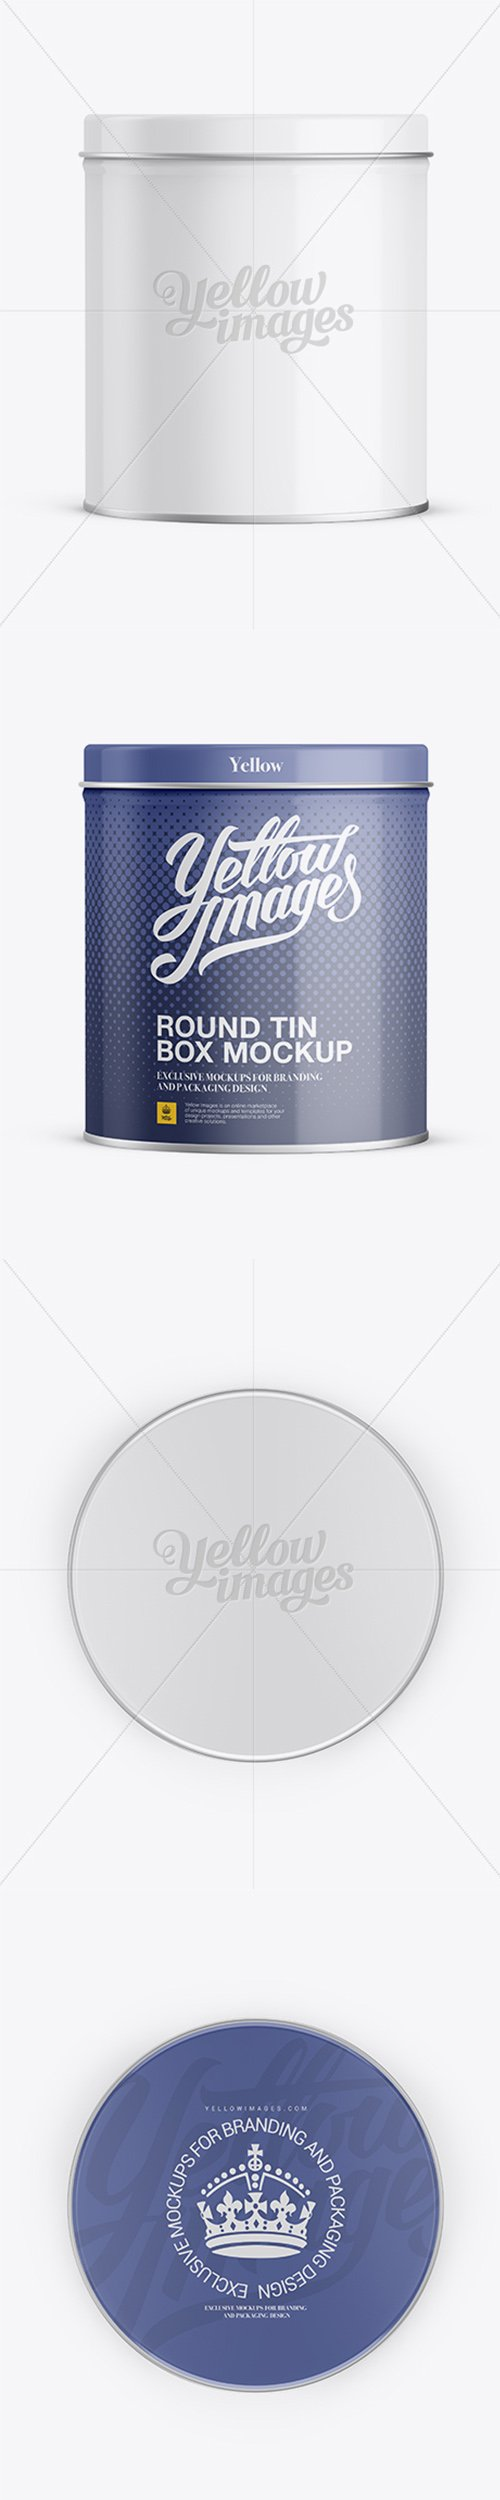 Small Round Tin Box Mockup 11830 TIF